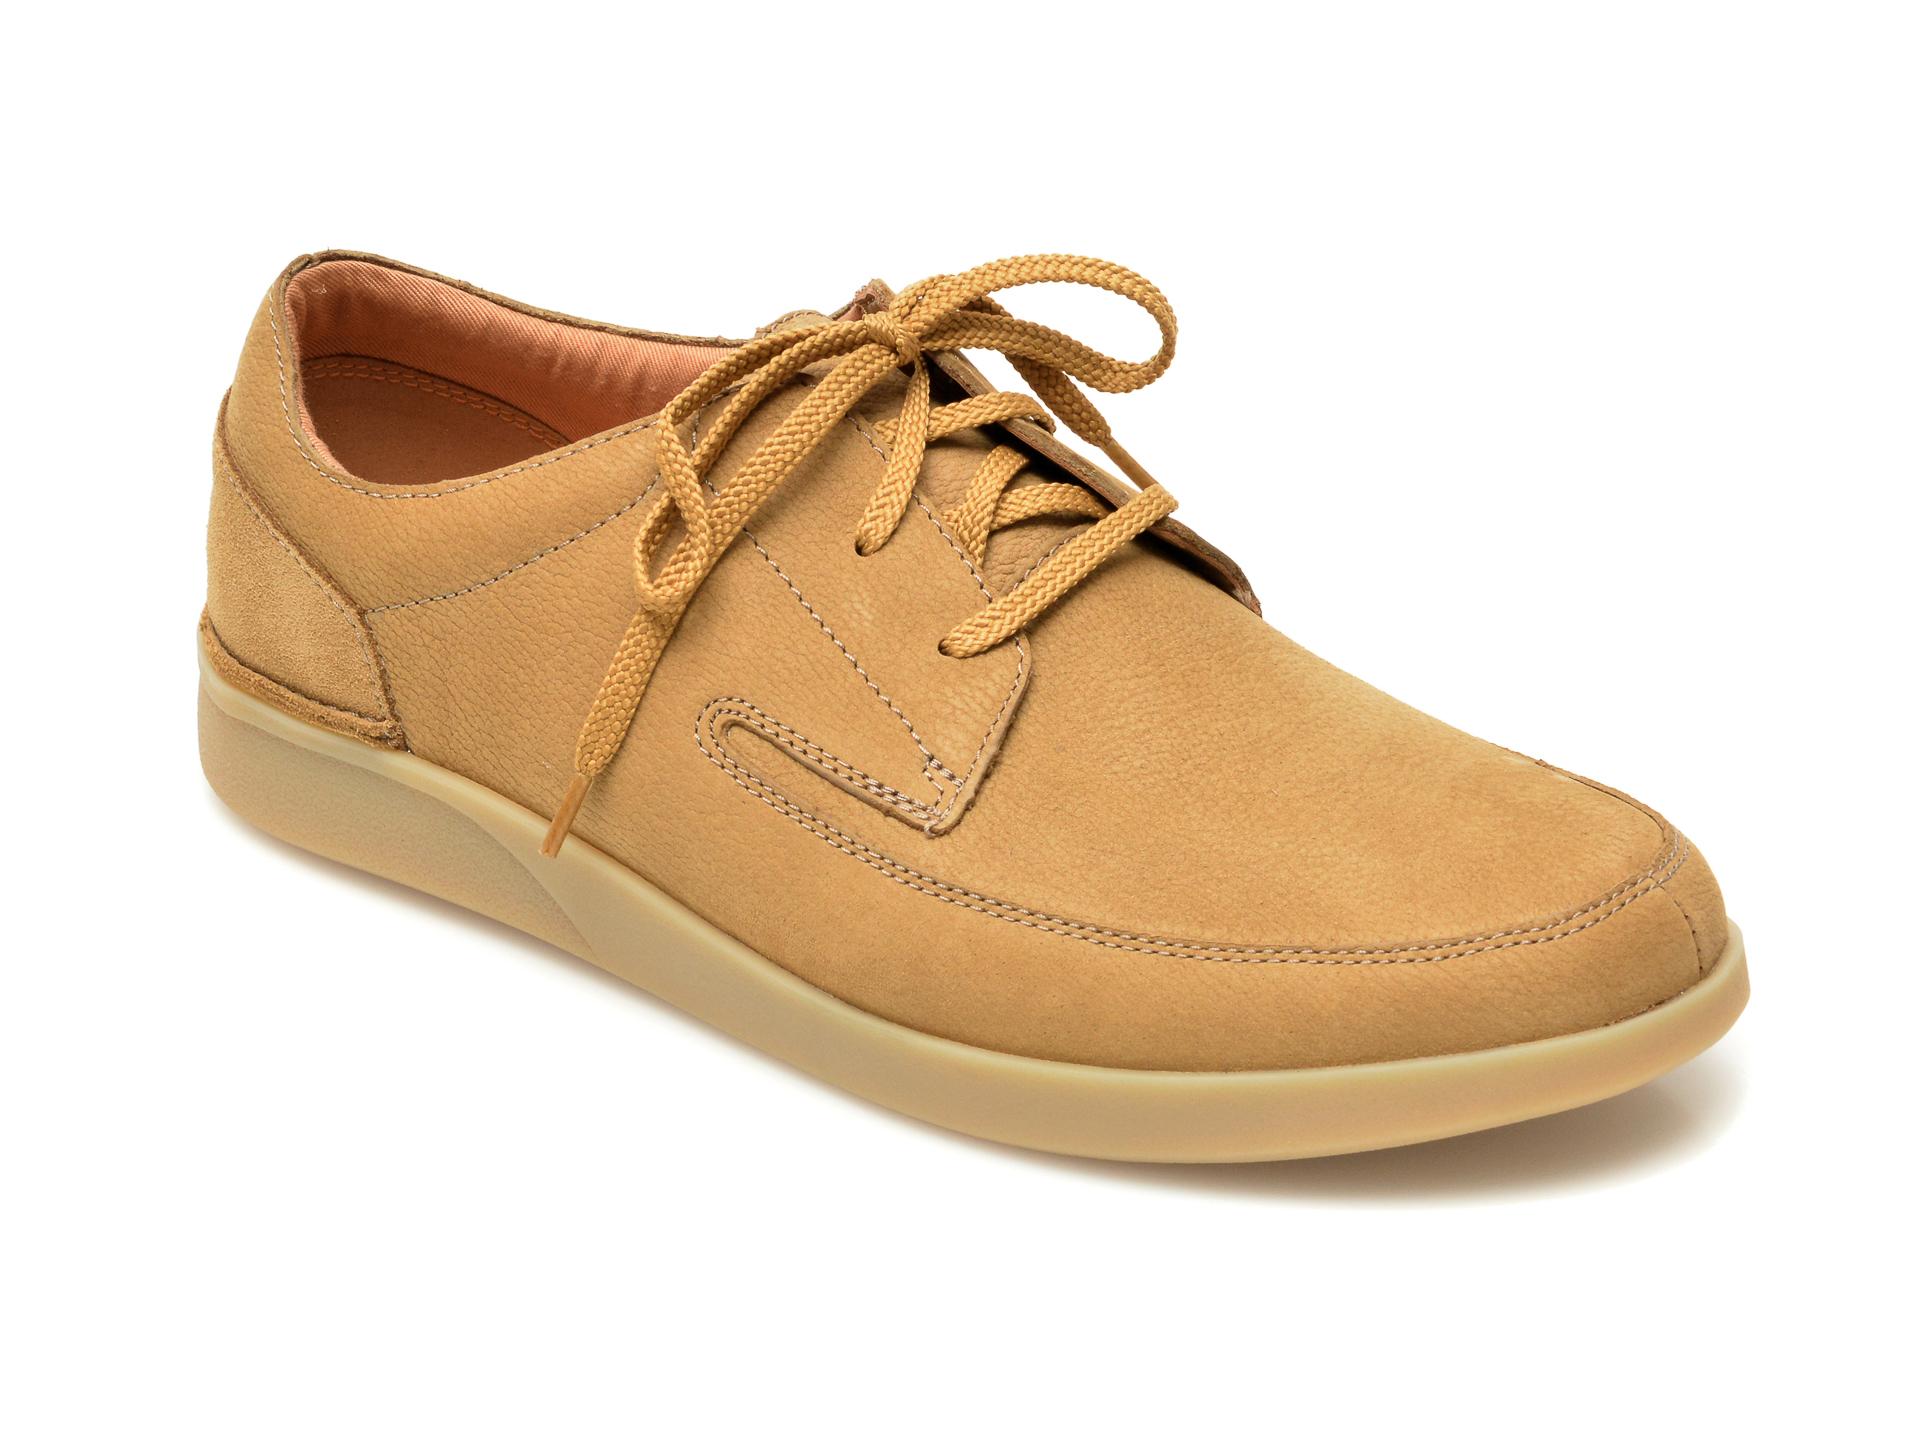 Pantofi CLARKS maro, Oakland Craft, din nabuc imagine otter.ro